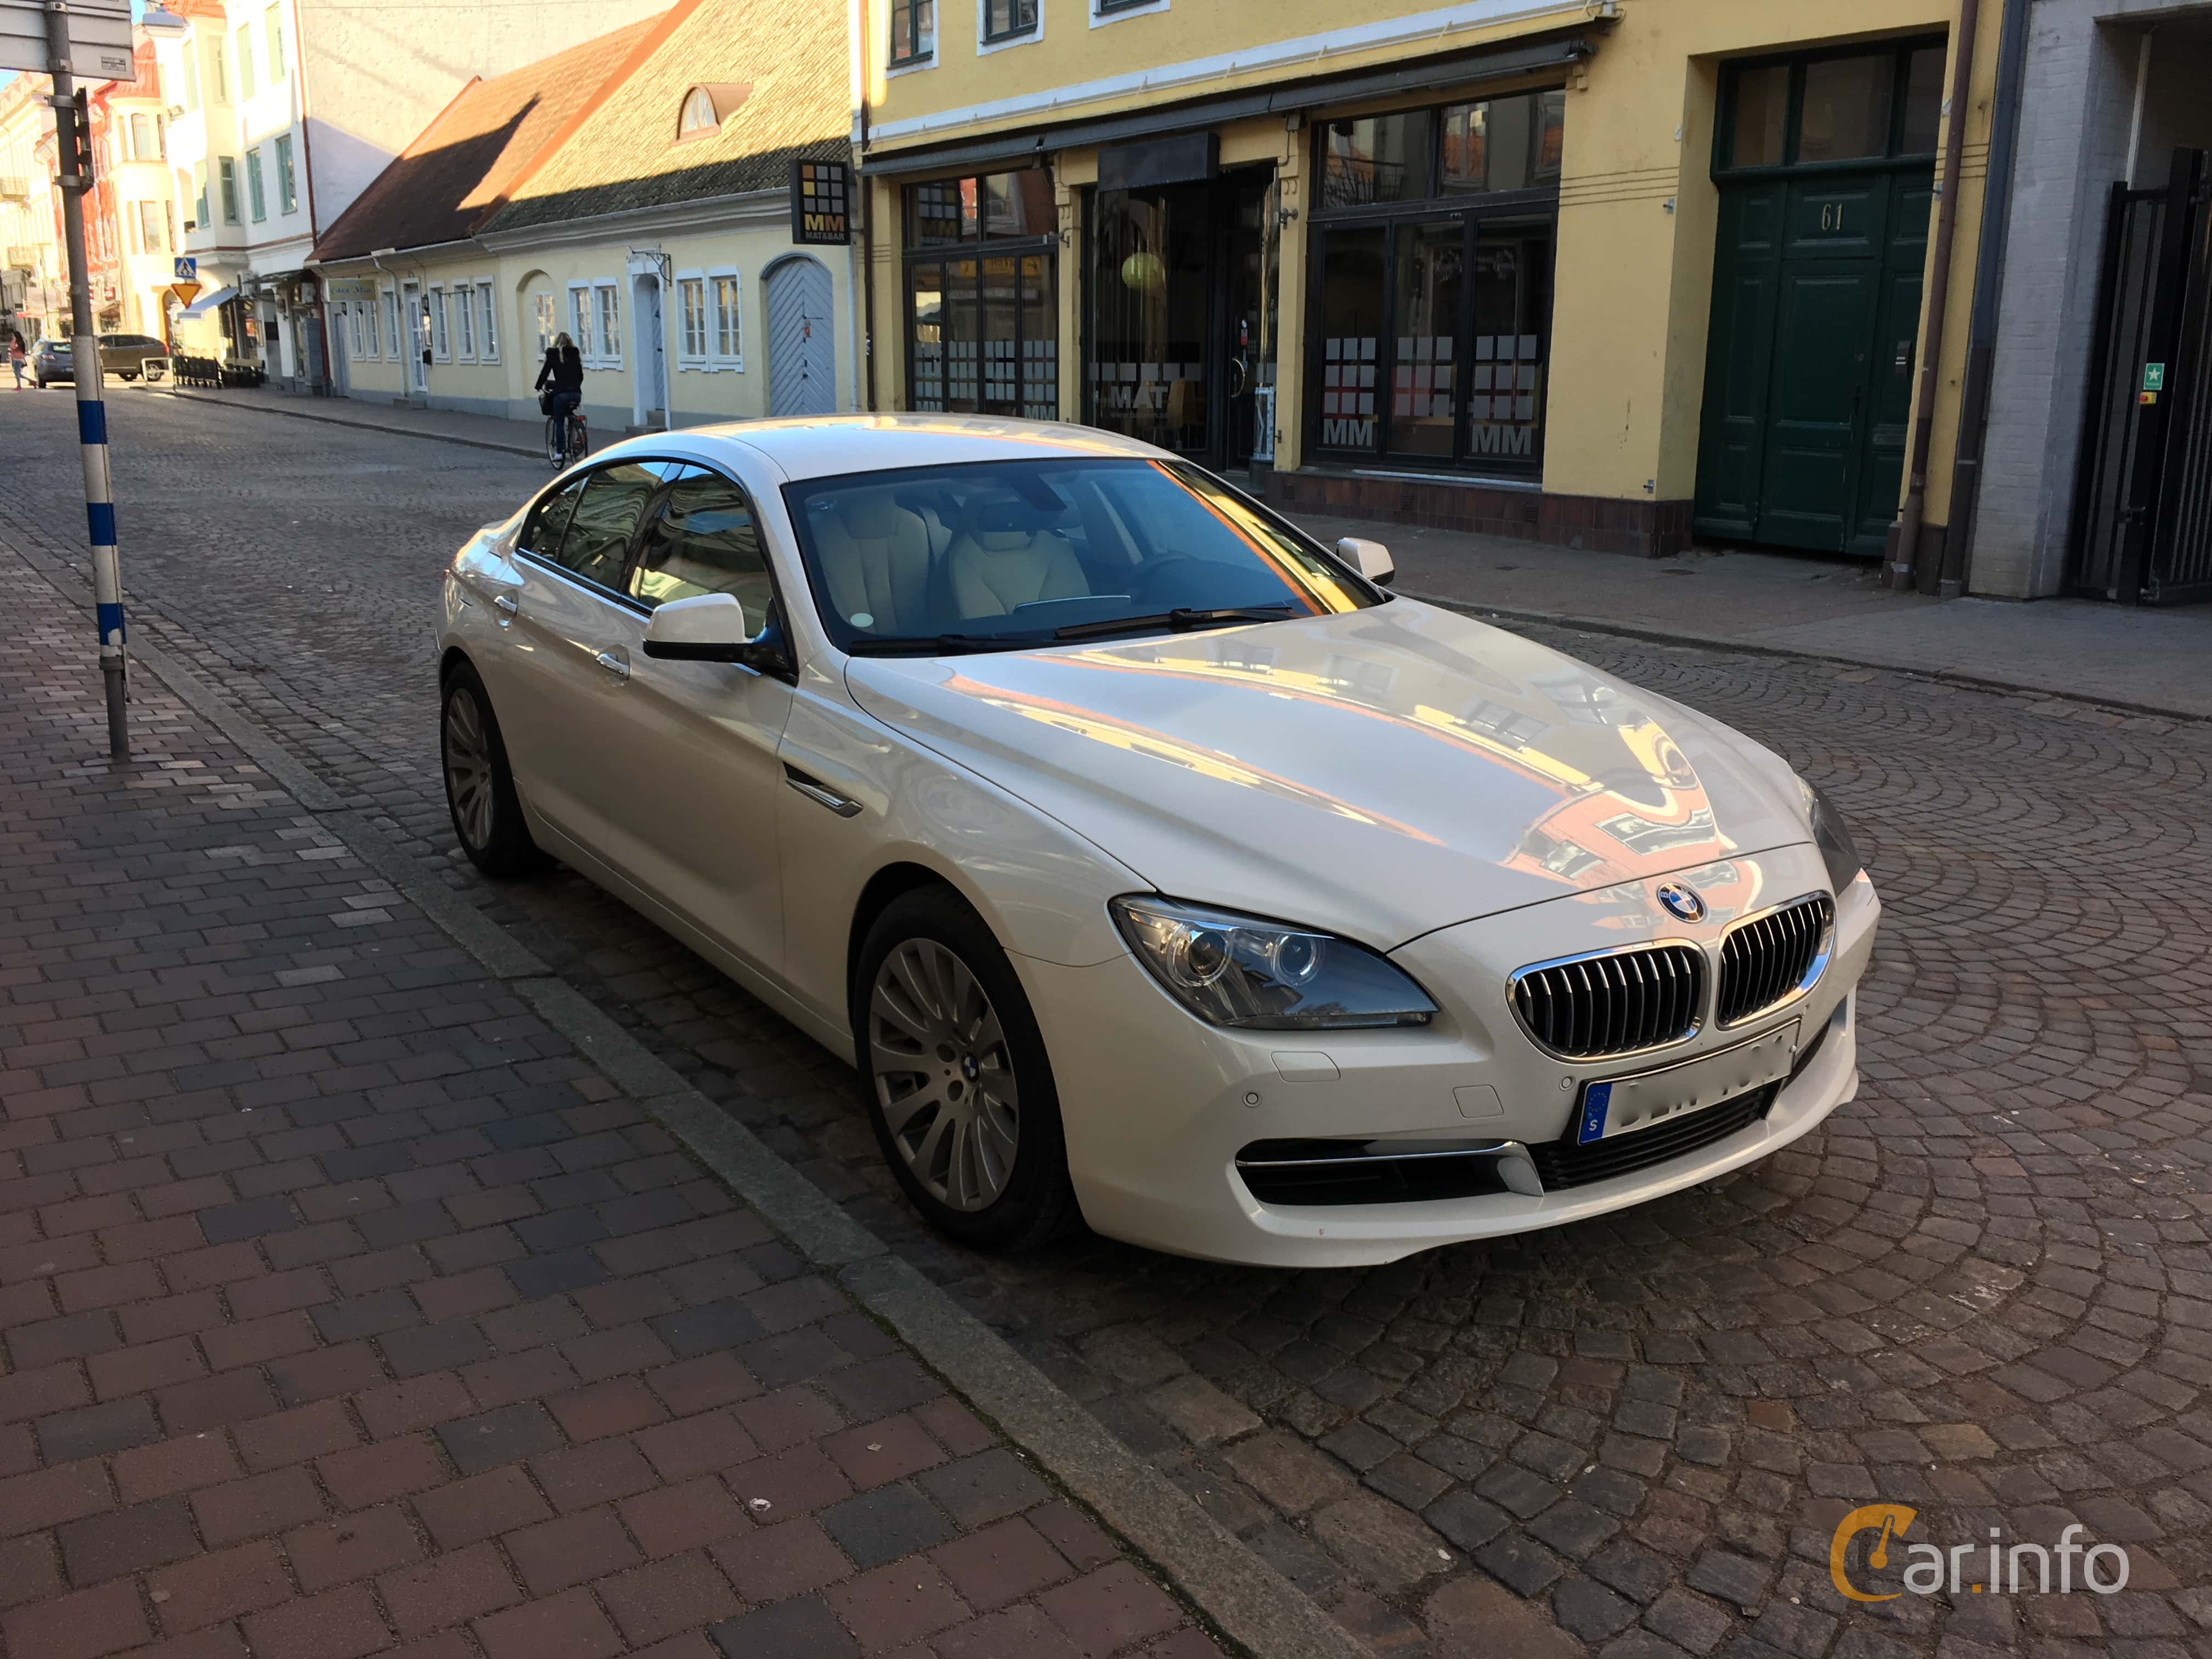 BMW 6 Series by sebastianjohansson